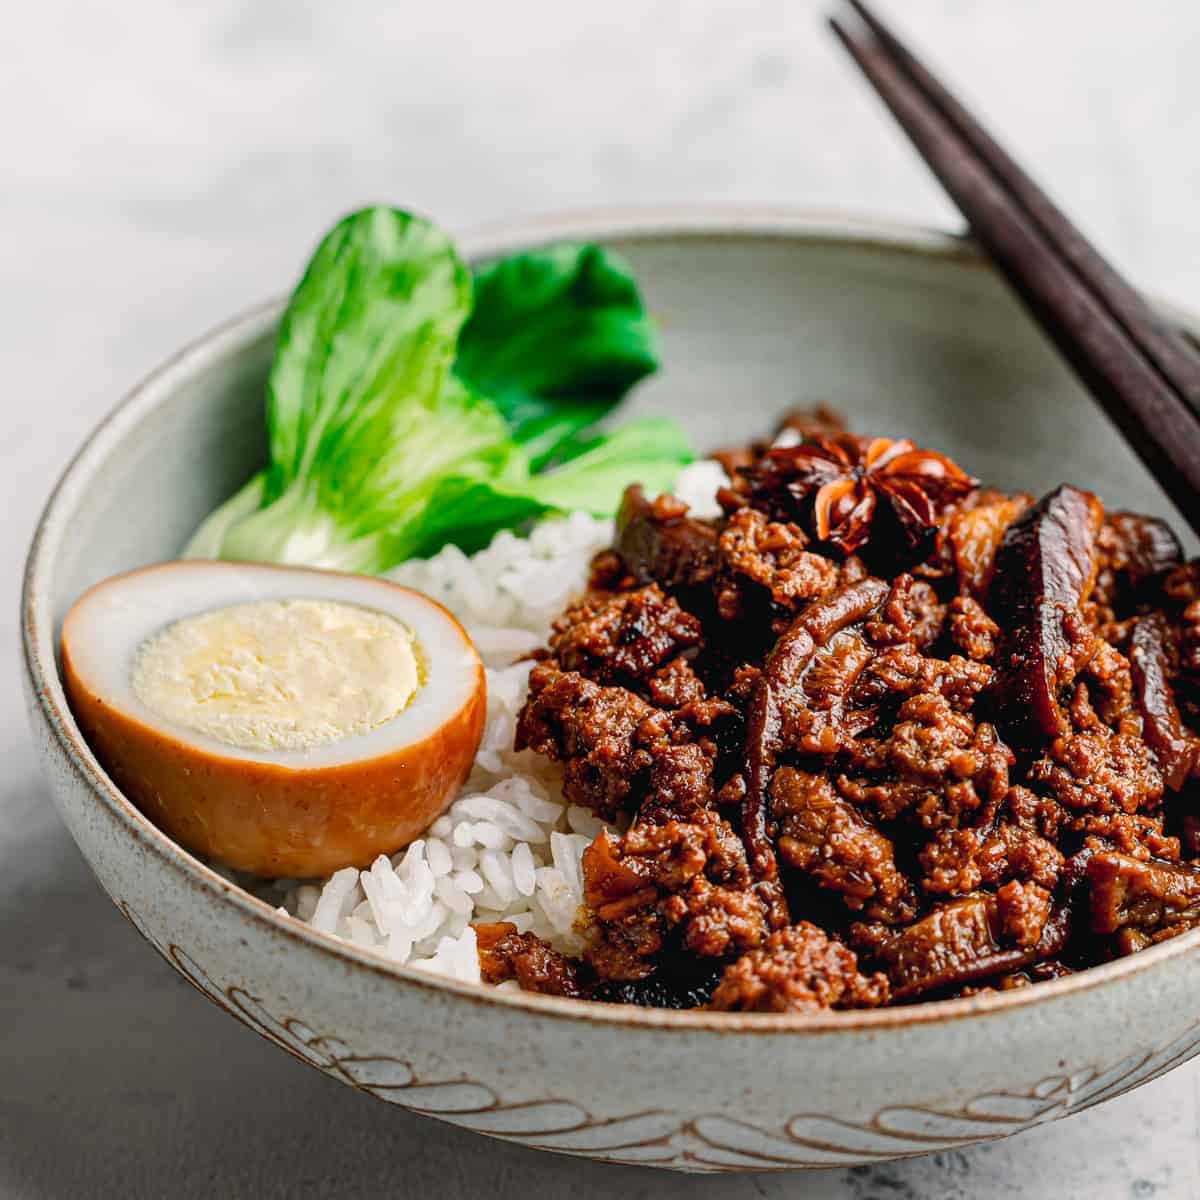 Taiwanese braised pork over rice.